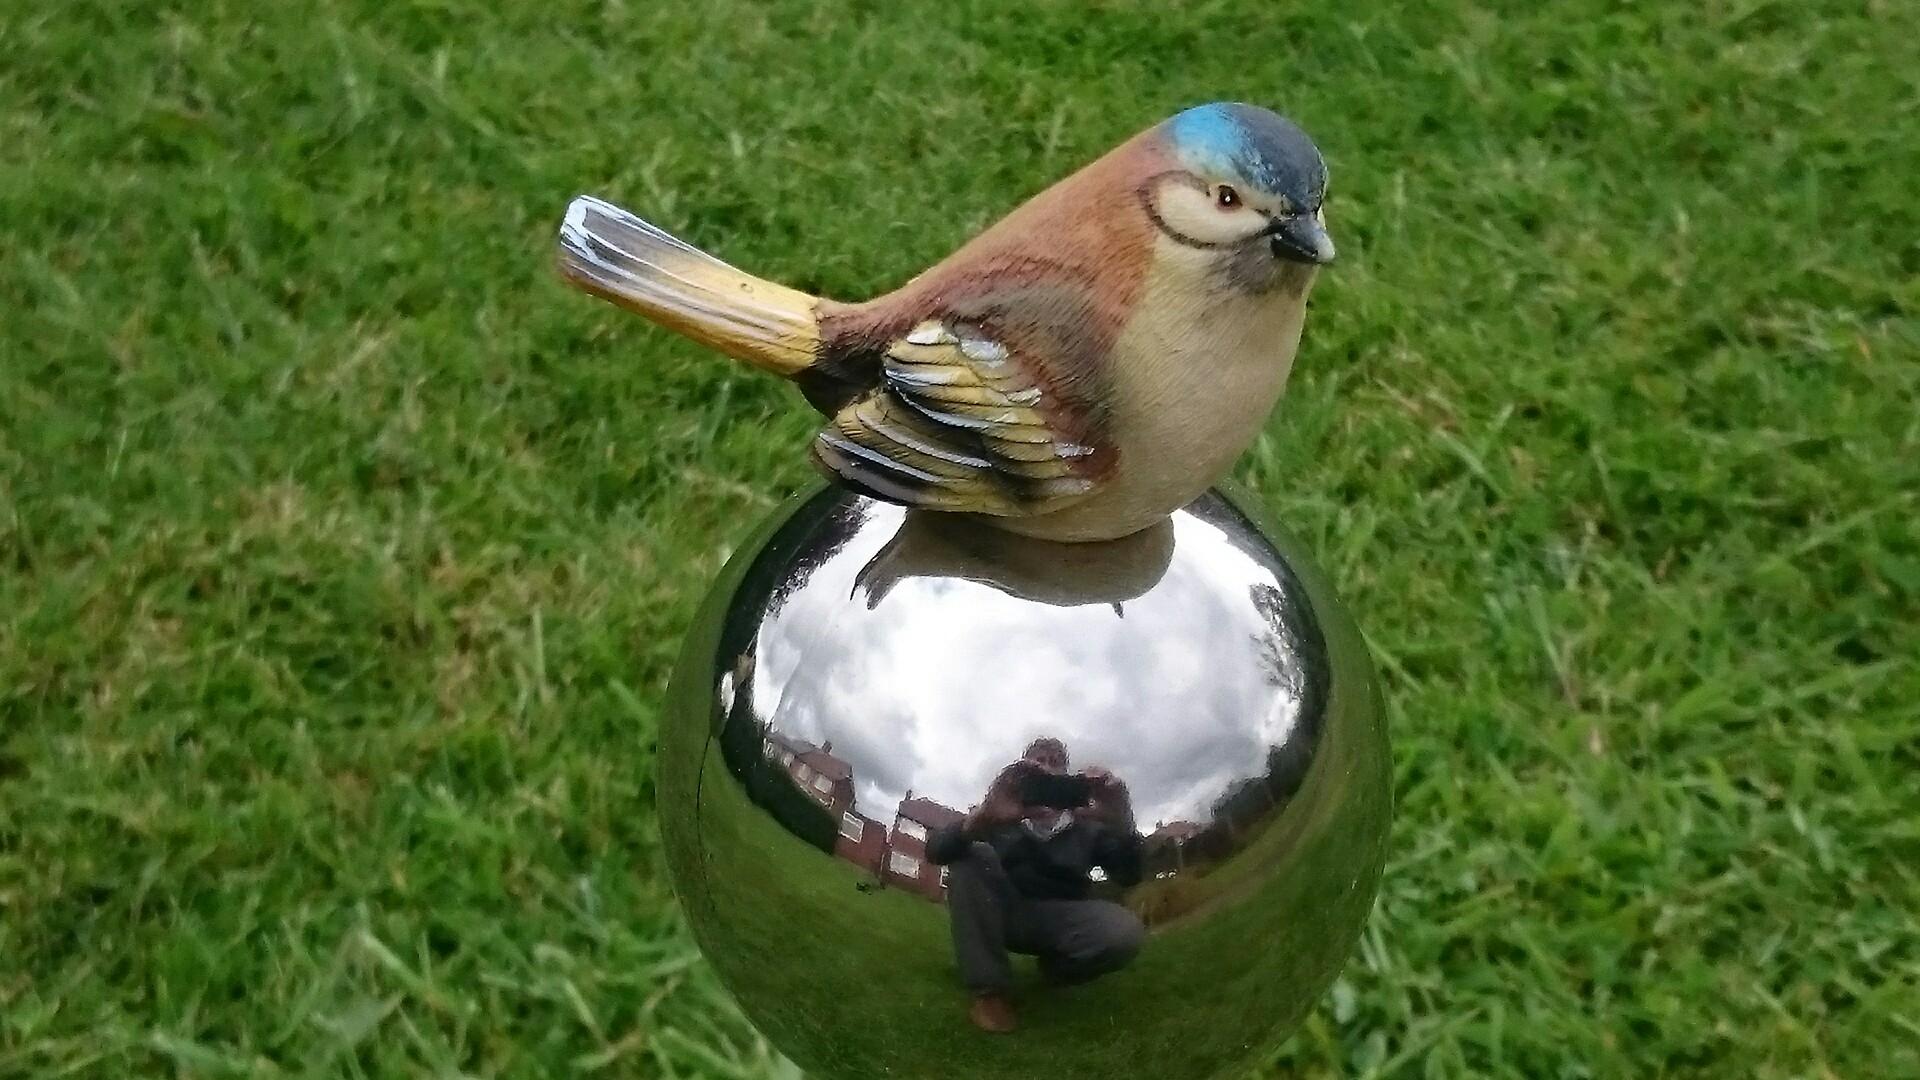 Best 28 lawn ornaments for sale stone bird baths for for Lawn ornaments for sale